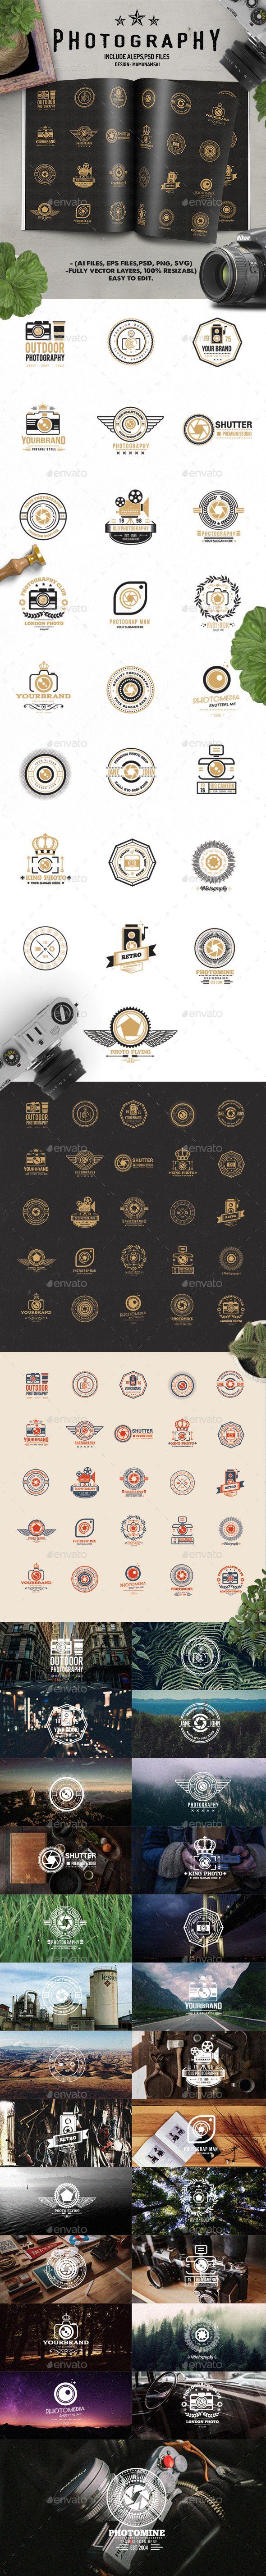 25 Photography Logo Design Template - Web Element Template PSD, EPS Vector, AI Illustrator. Download here: https://graphicriver.net/item/25-photography-logo-design/17353791?ref=yinkira